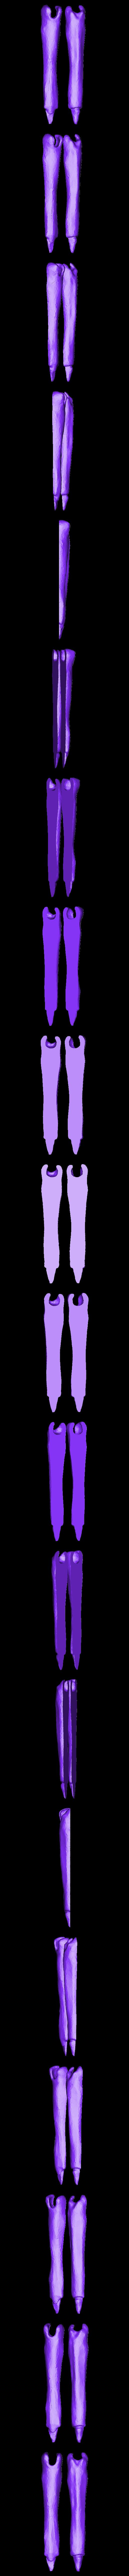 FingerTip_PLA.stl Download free STL file Agisis Ultimate Alien Face Hugger (40in x 23in - LIFE SIZE!) • Model to 3D print, Hoofbaugh